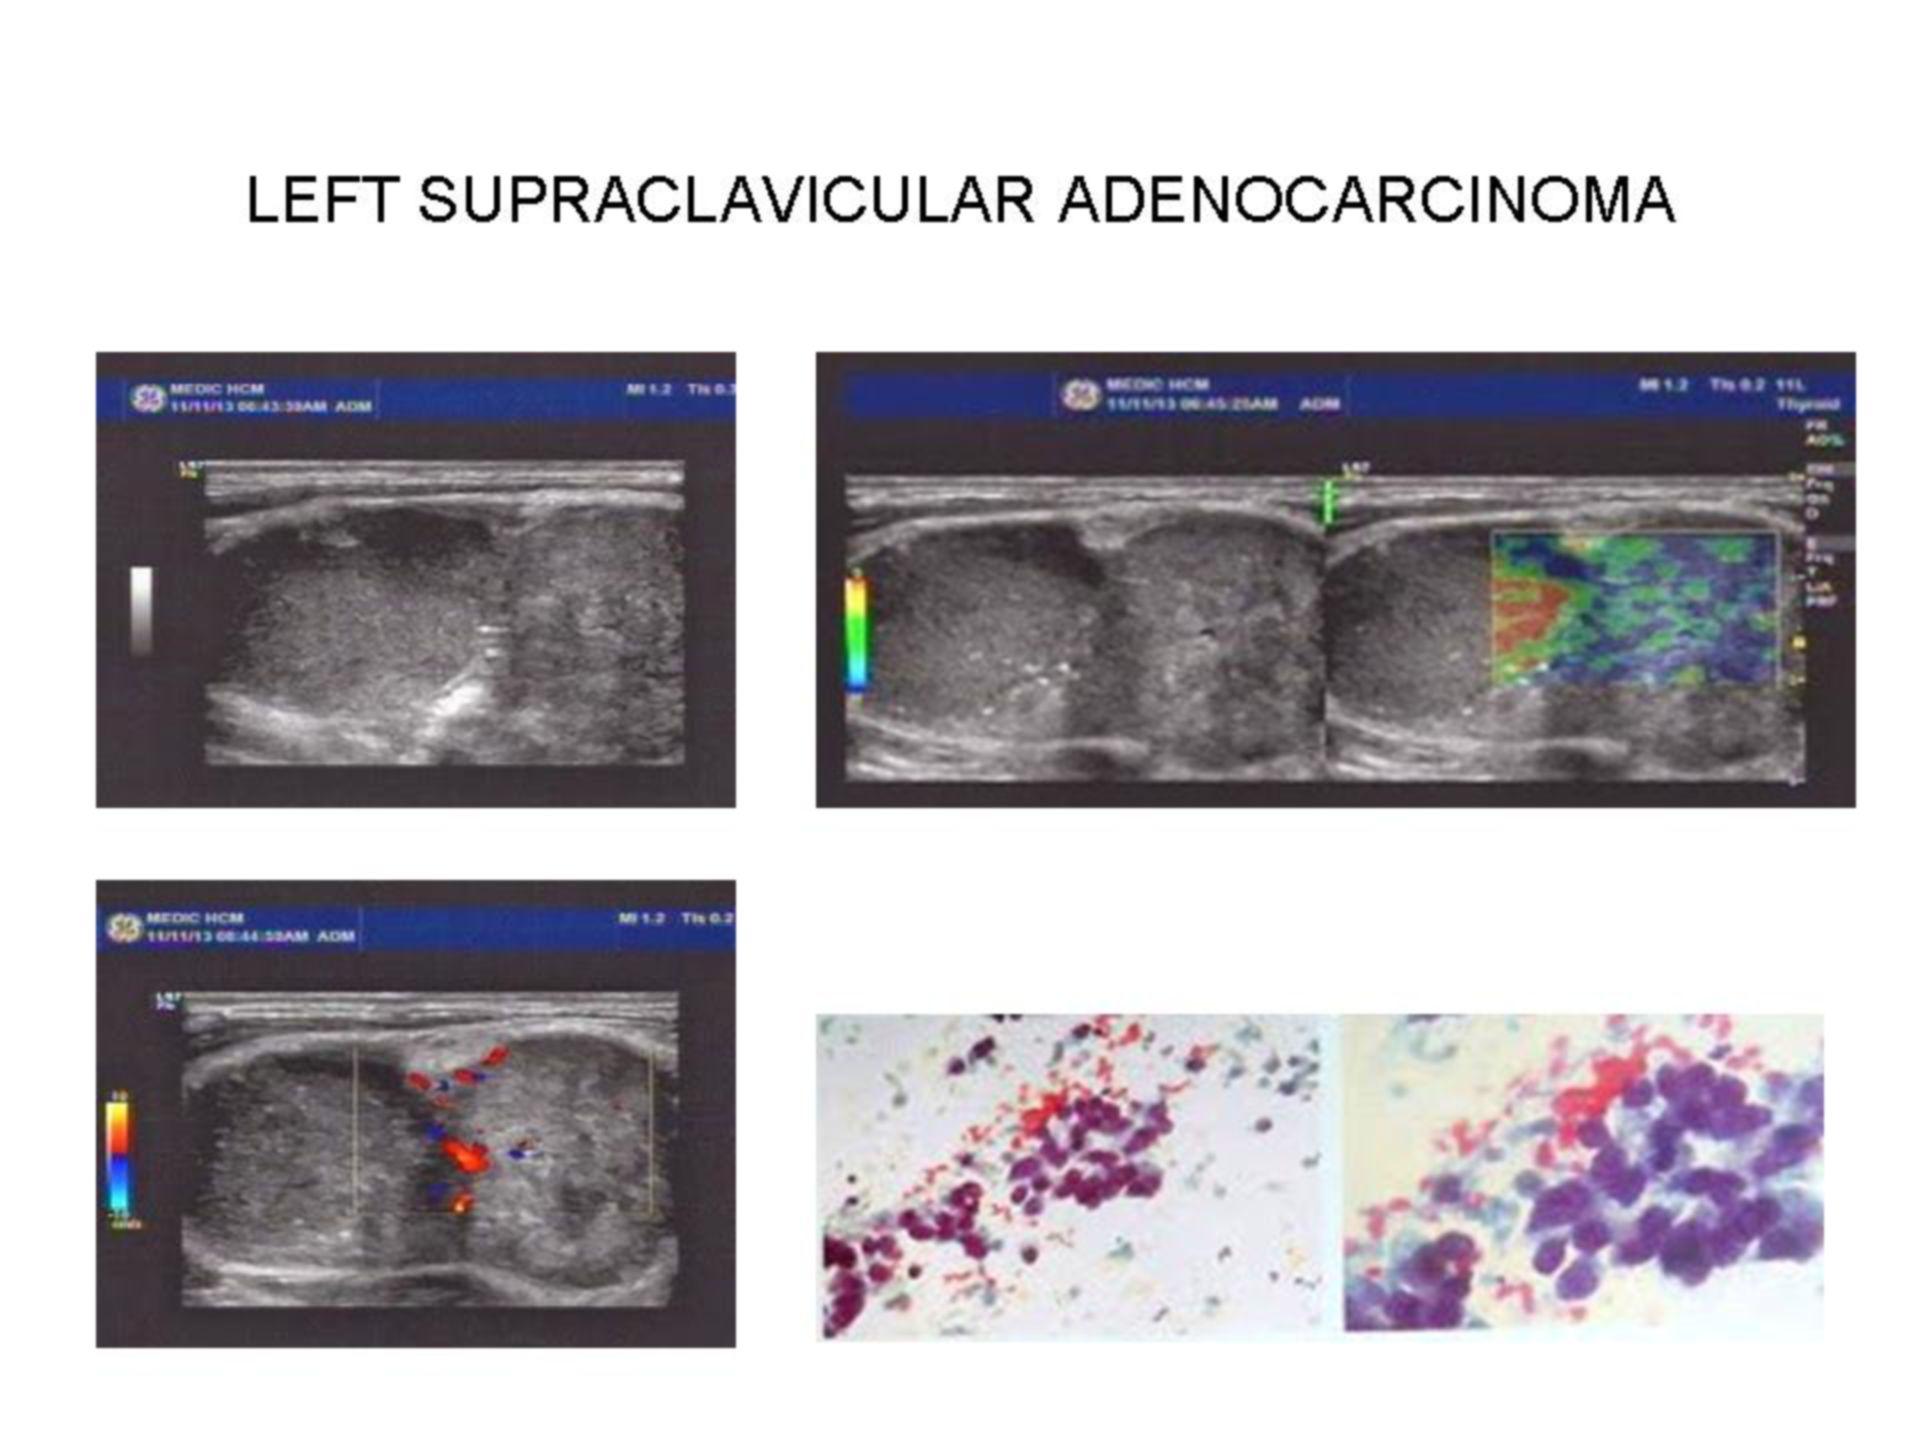 Supraclavicular adenocarcinoma